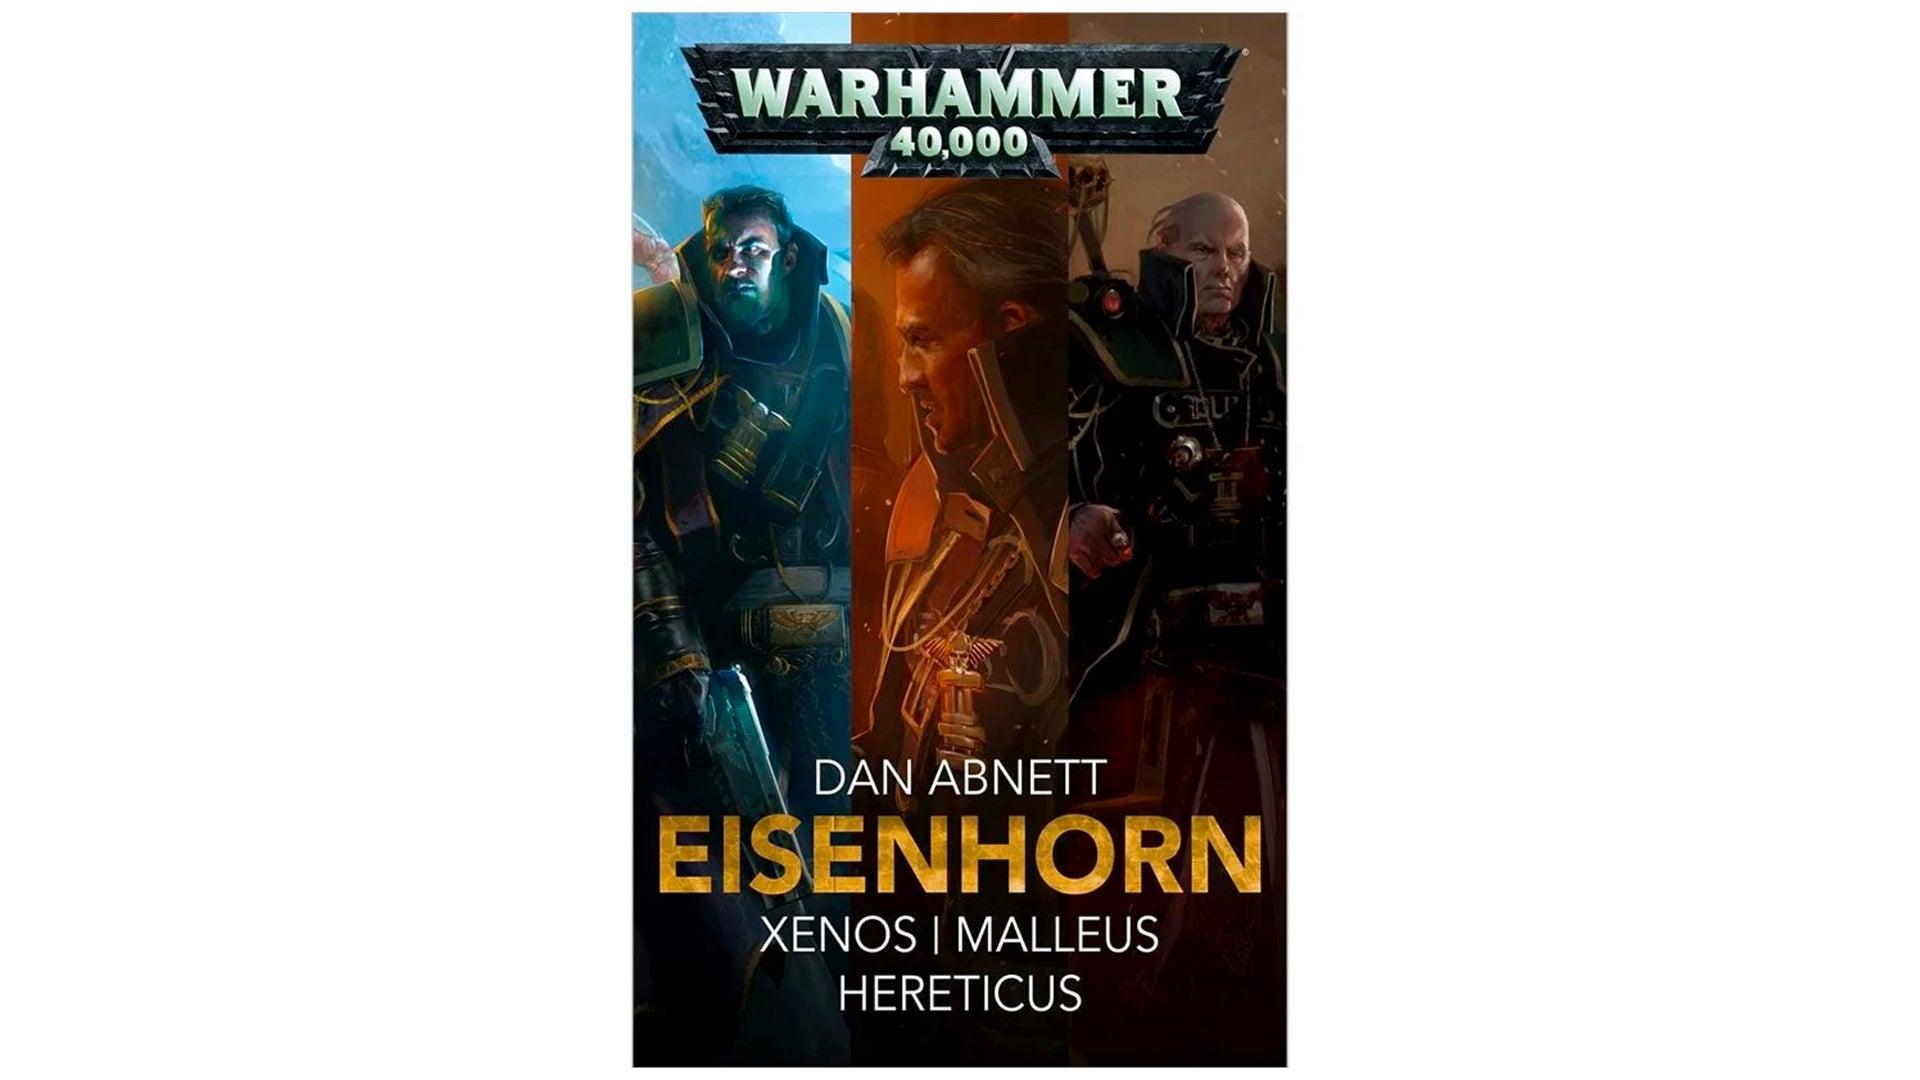 warhammer-40k-book-black-library-eisenhorn-omnibus.jpg